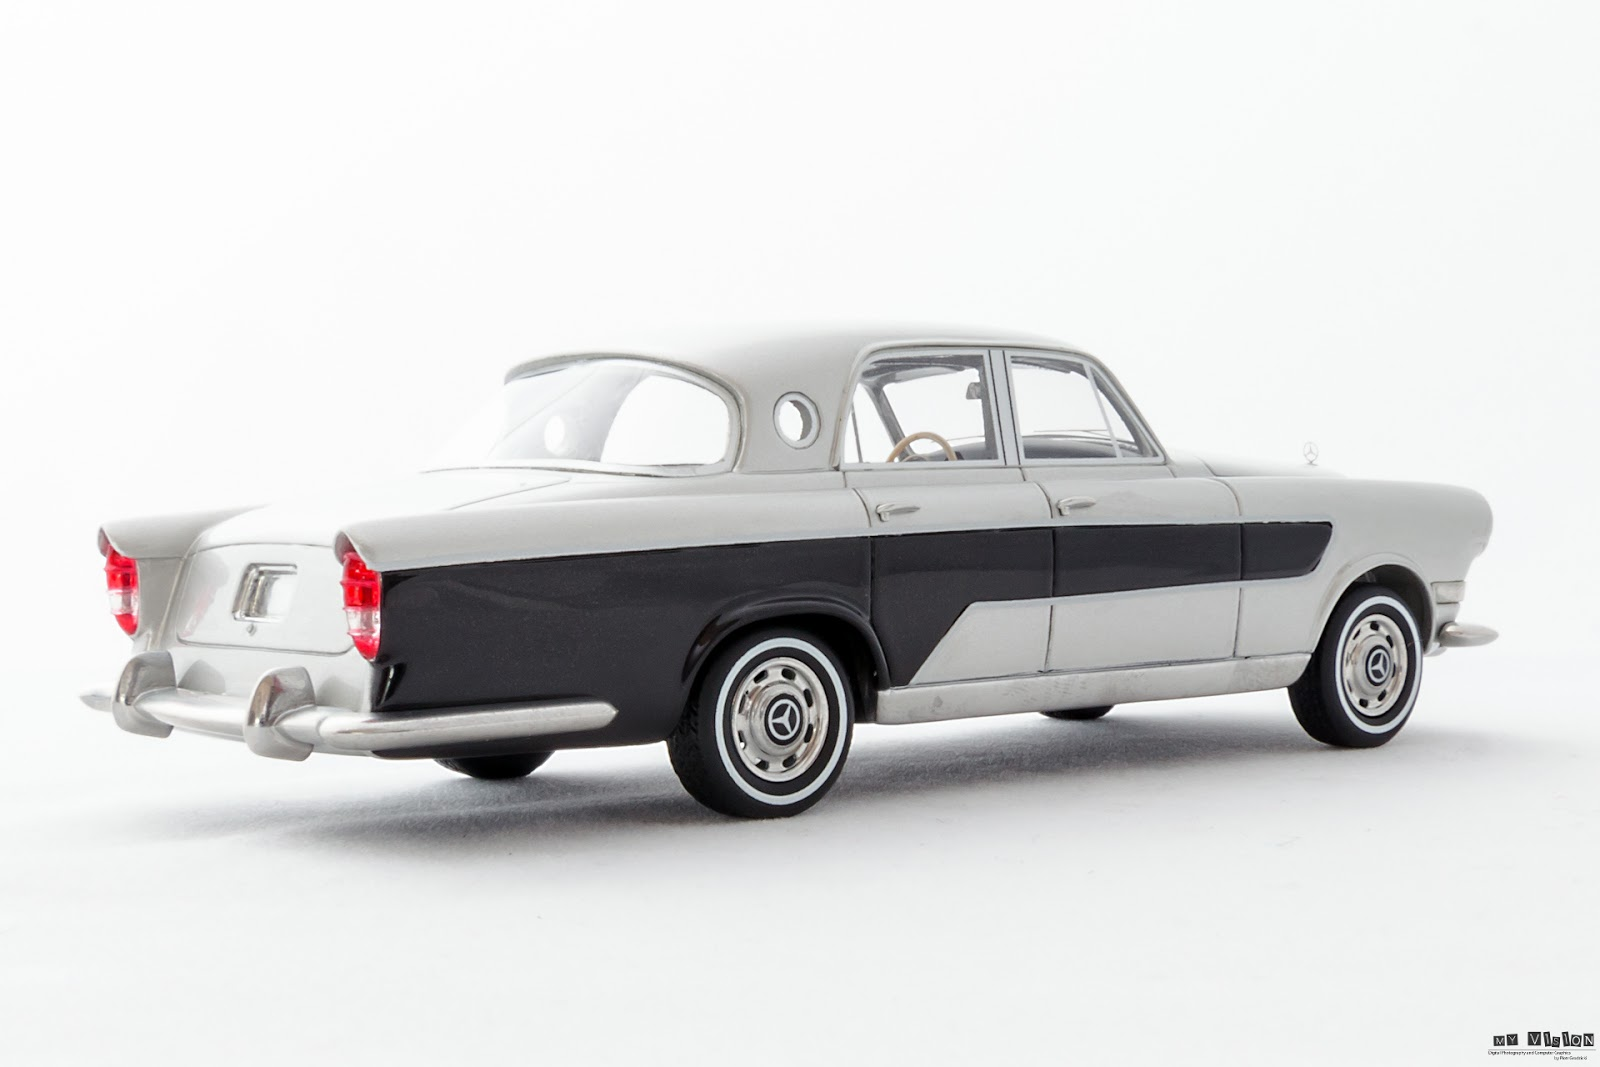 Miniautohobby mercedes benz ghia 300c for Mercedes benz 300c